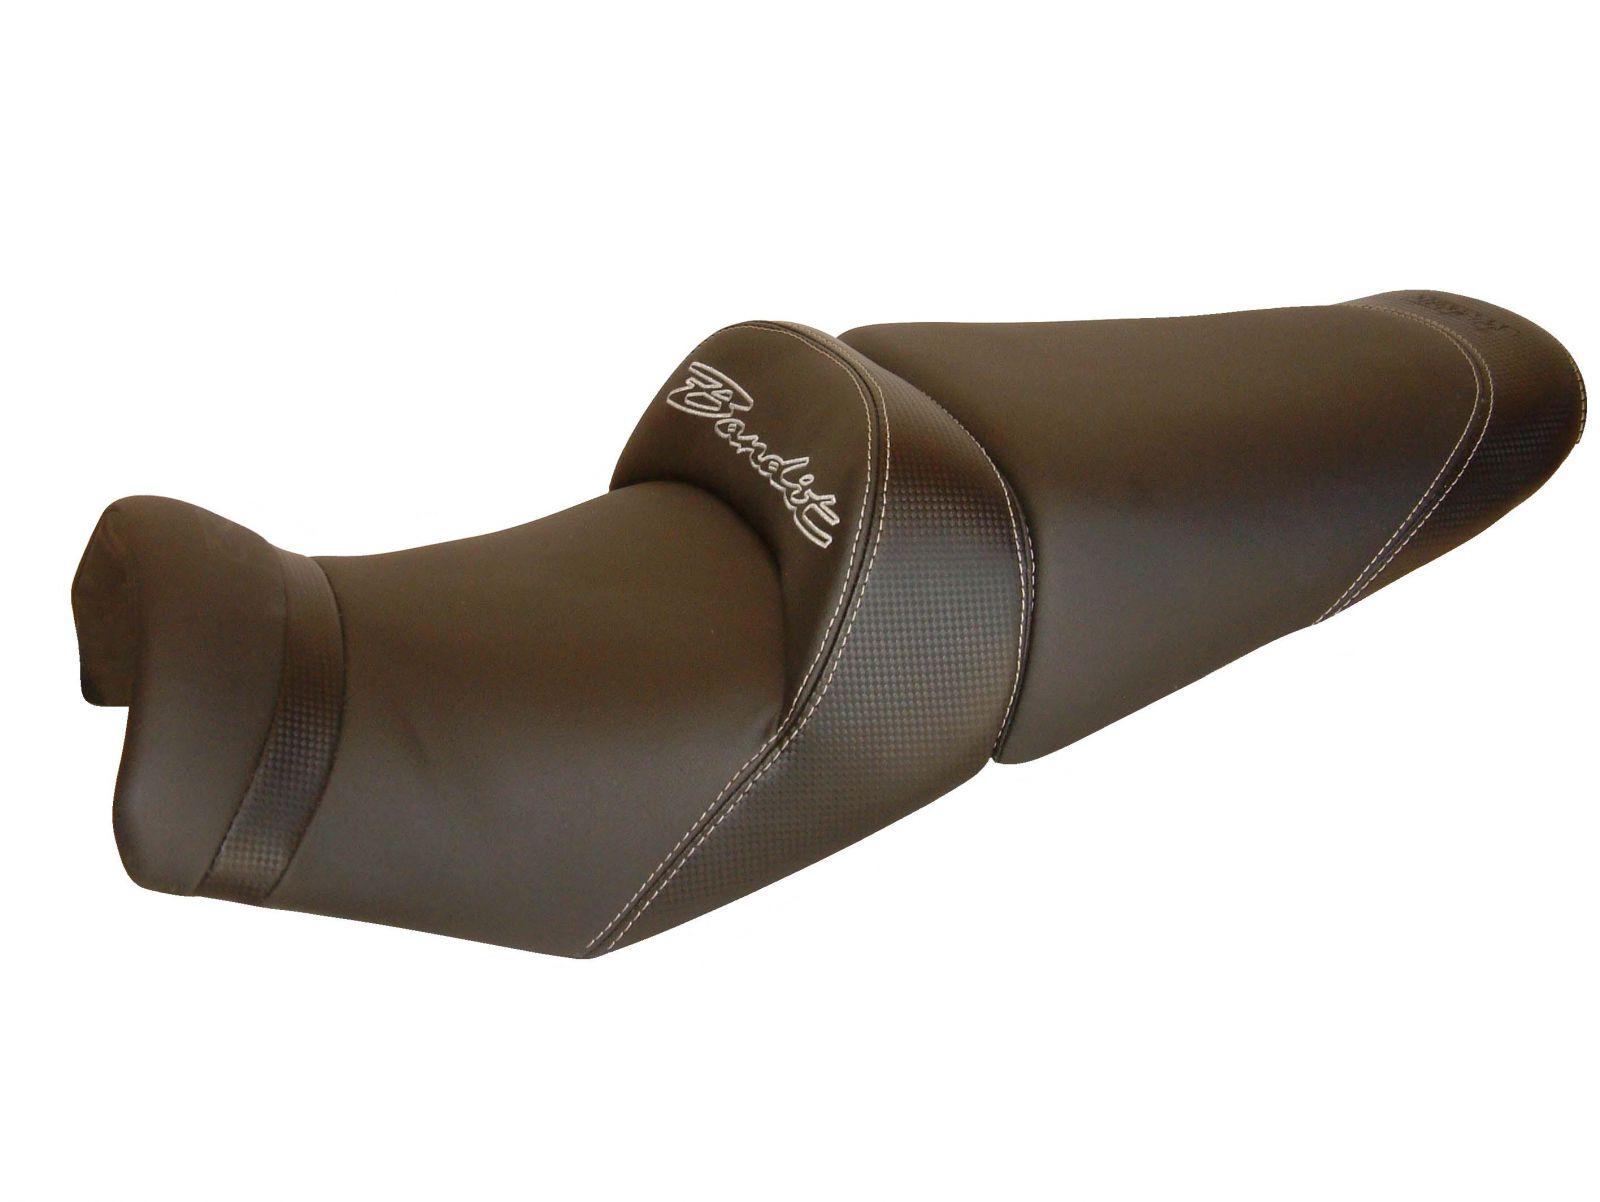 selle grand confort sgc3296 suzuki bandit 650 2010 tarifs pour france. Black Bedroom Furniture Sets. Home Design Ideas